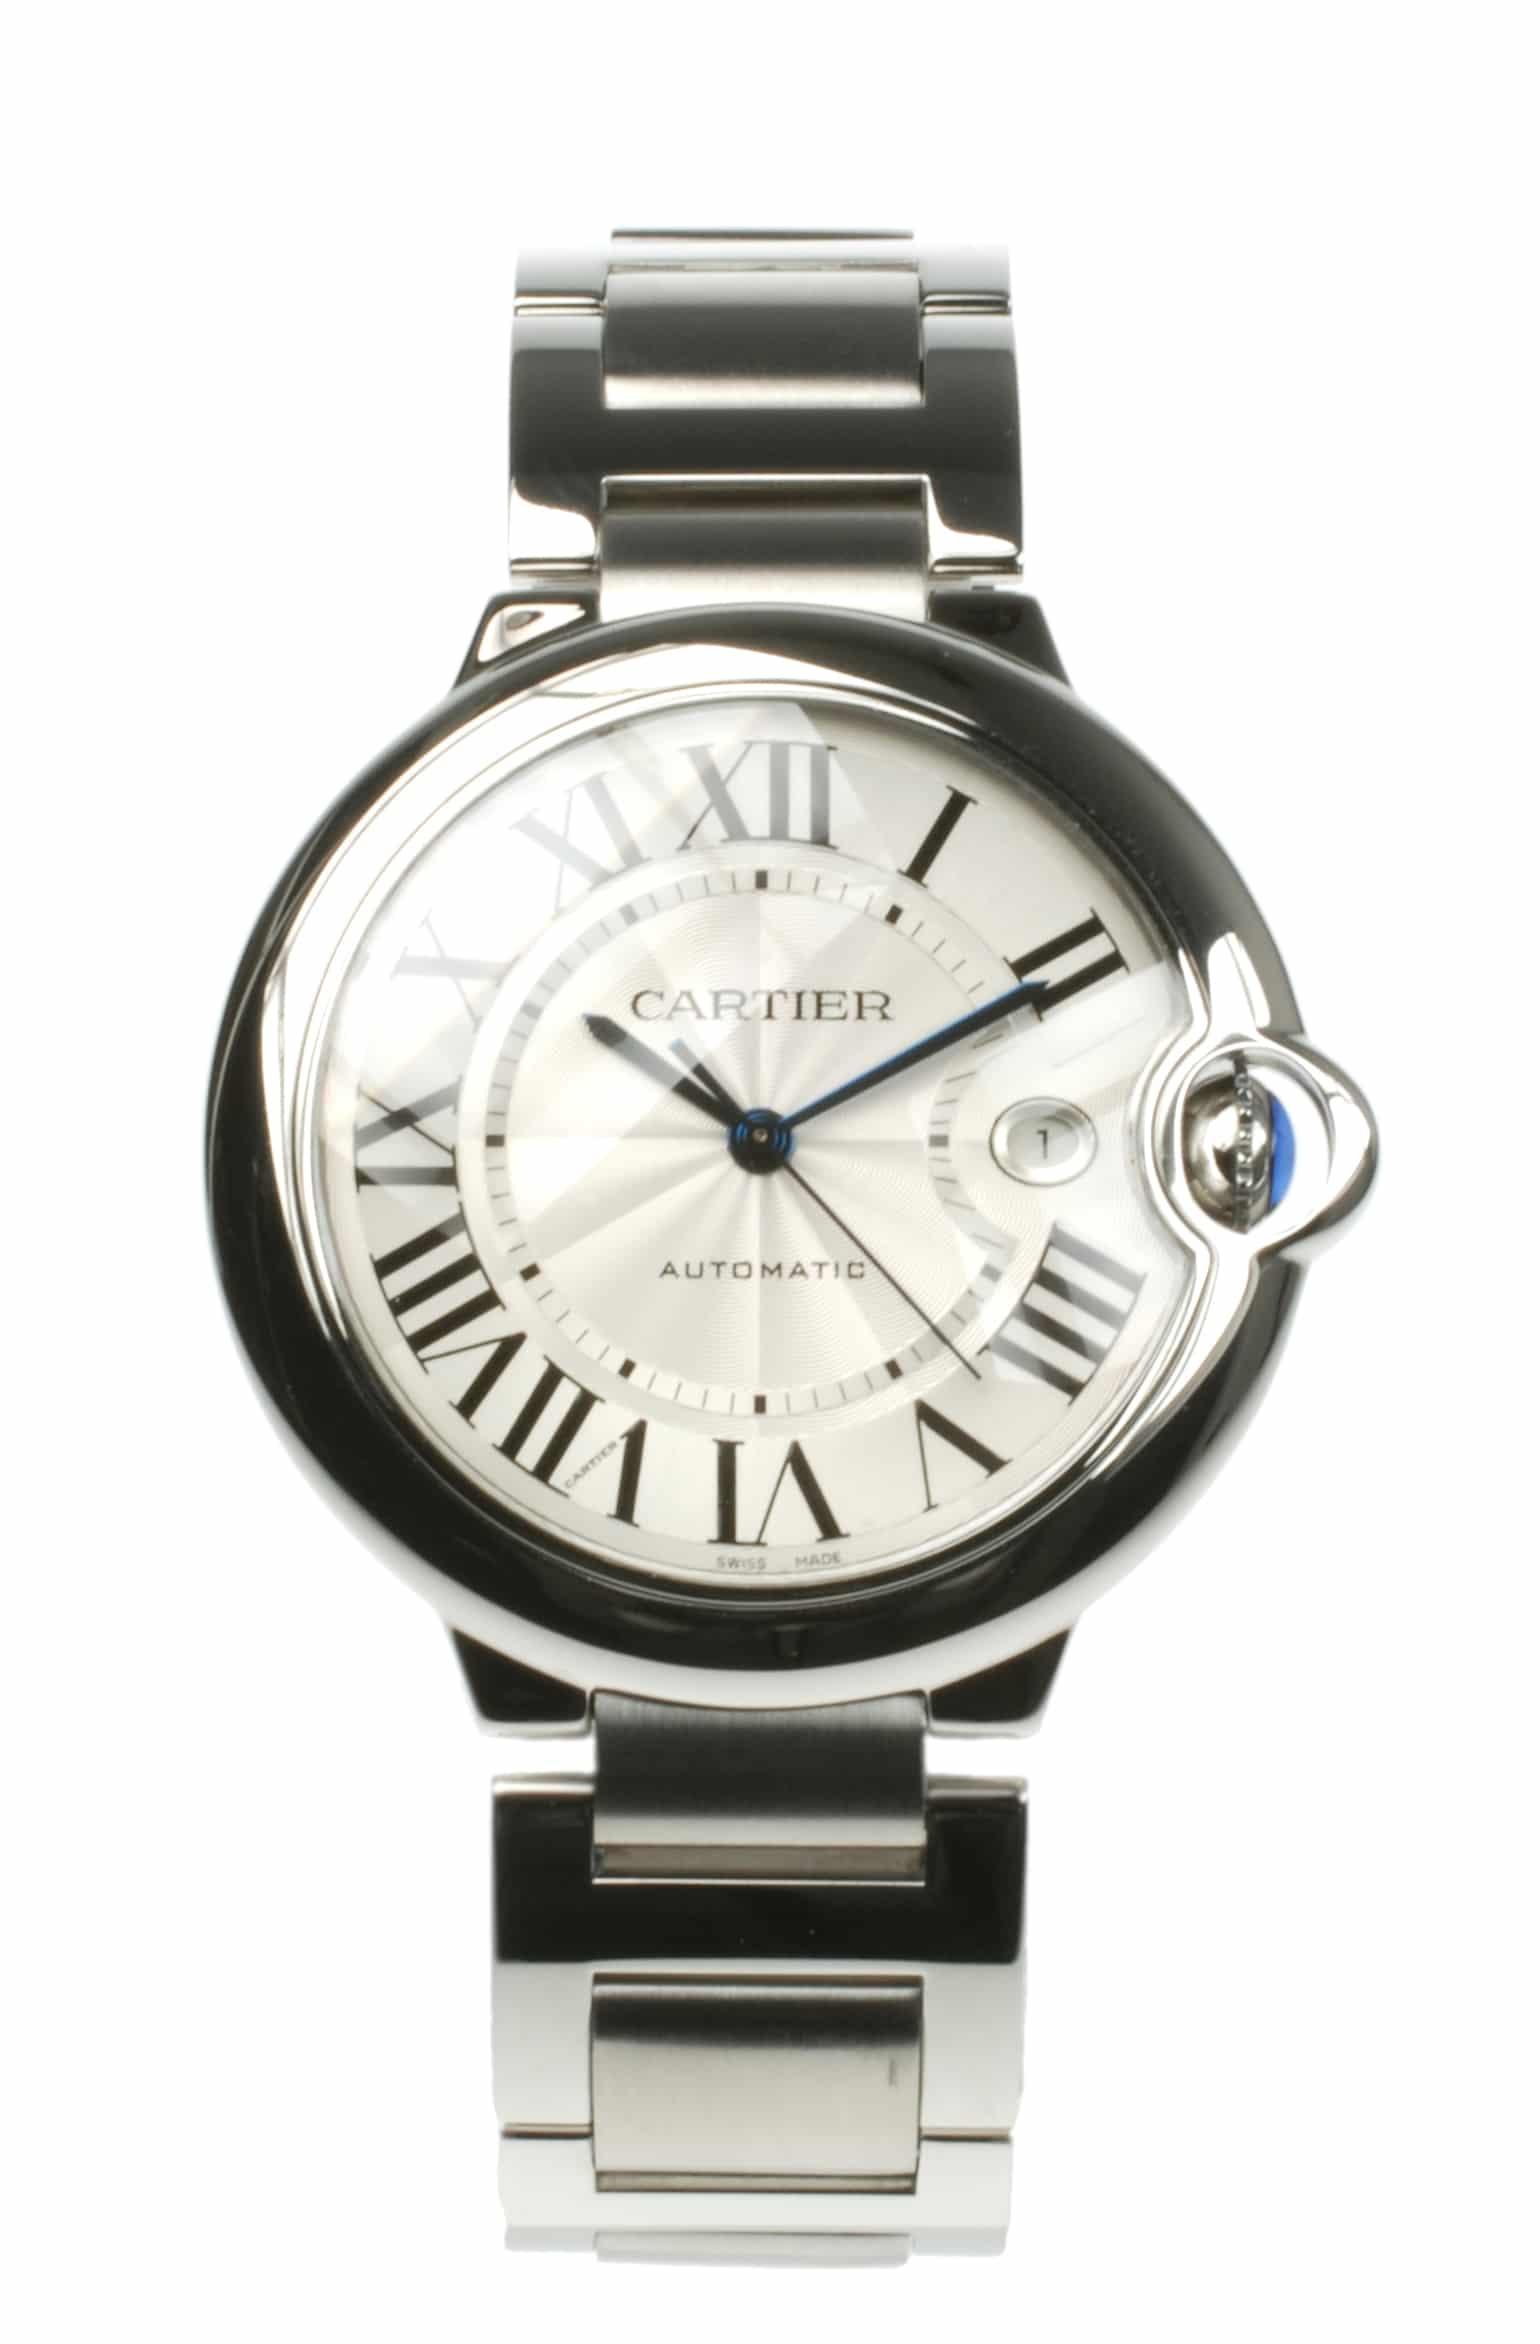 Cartier Ballon Bleu From 2018 Preowned Watch